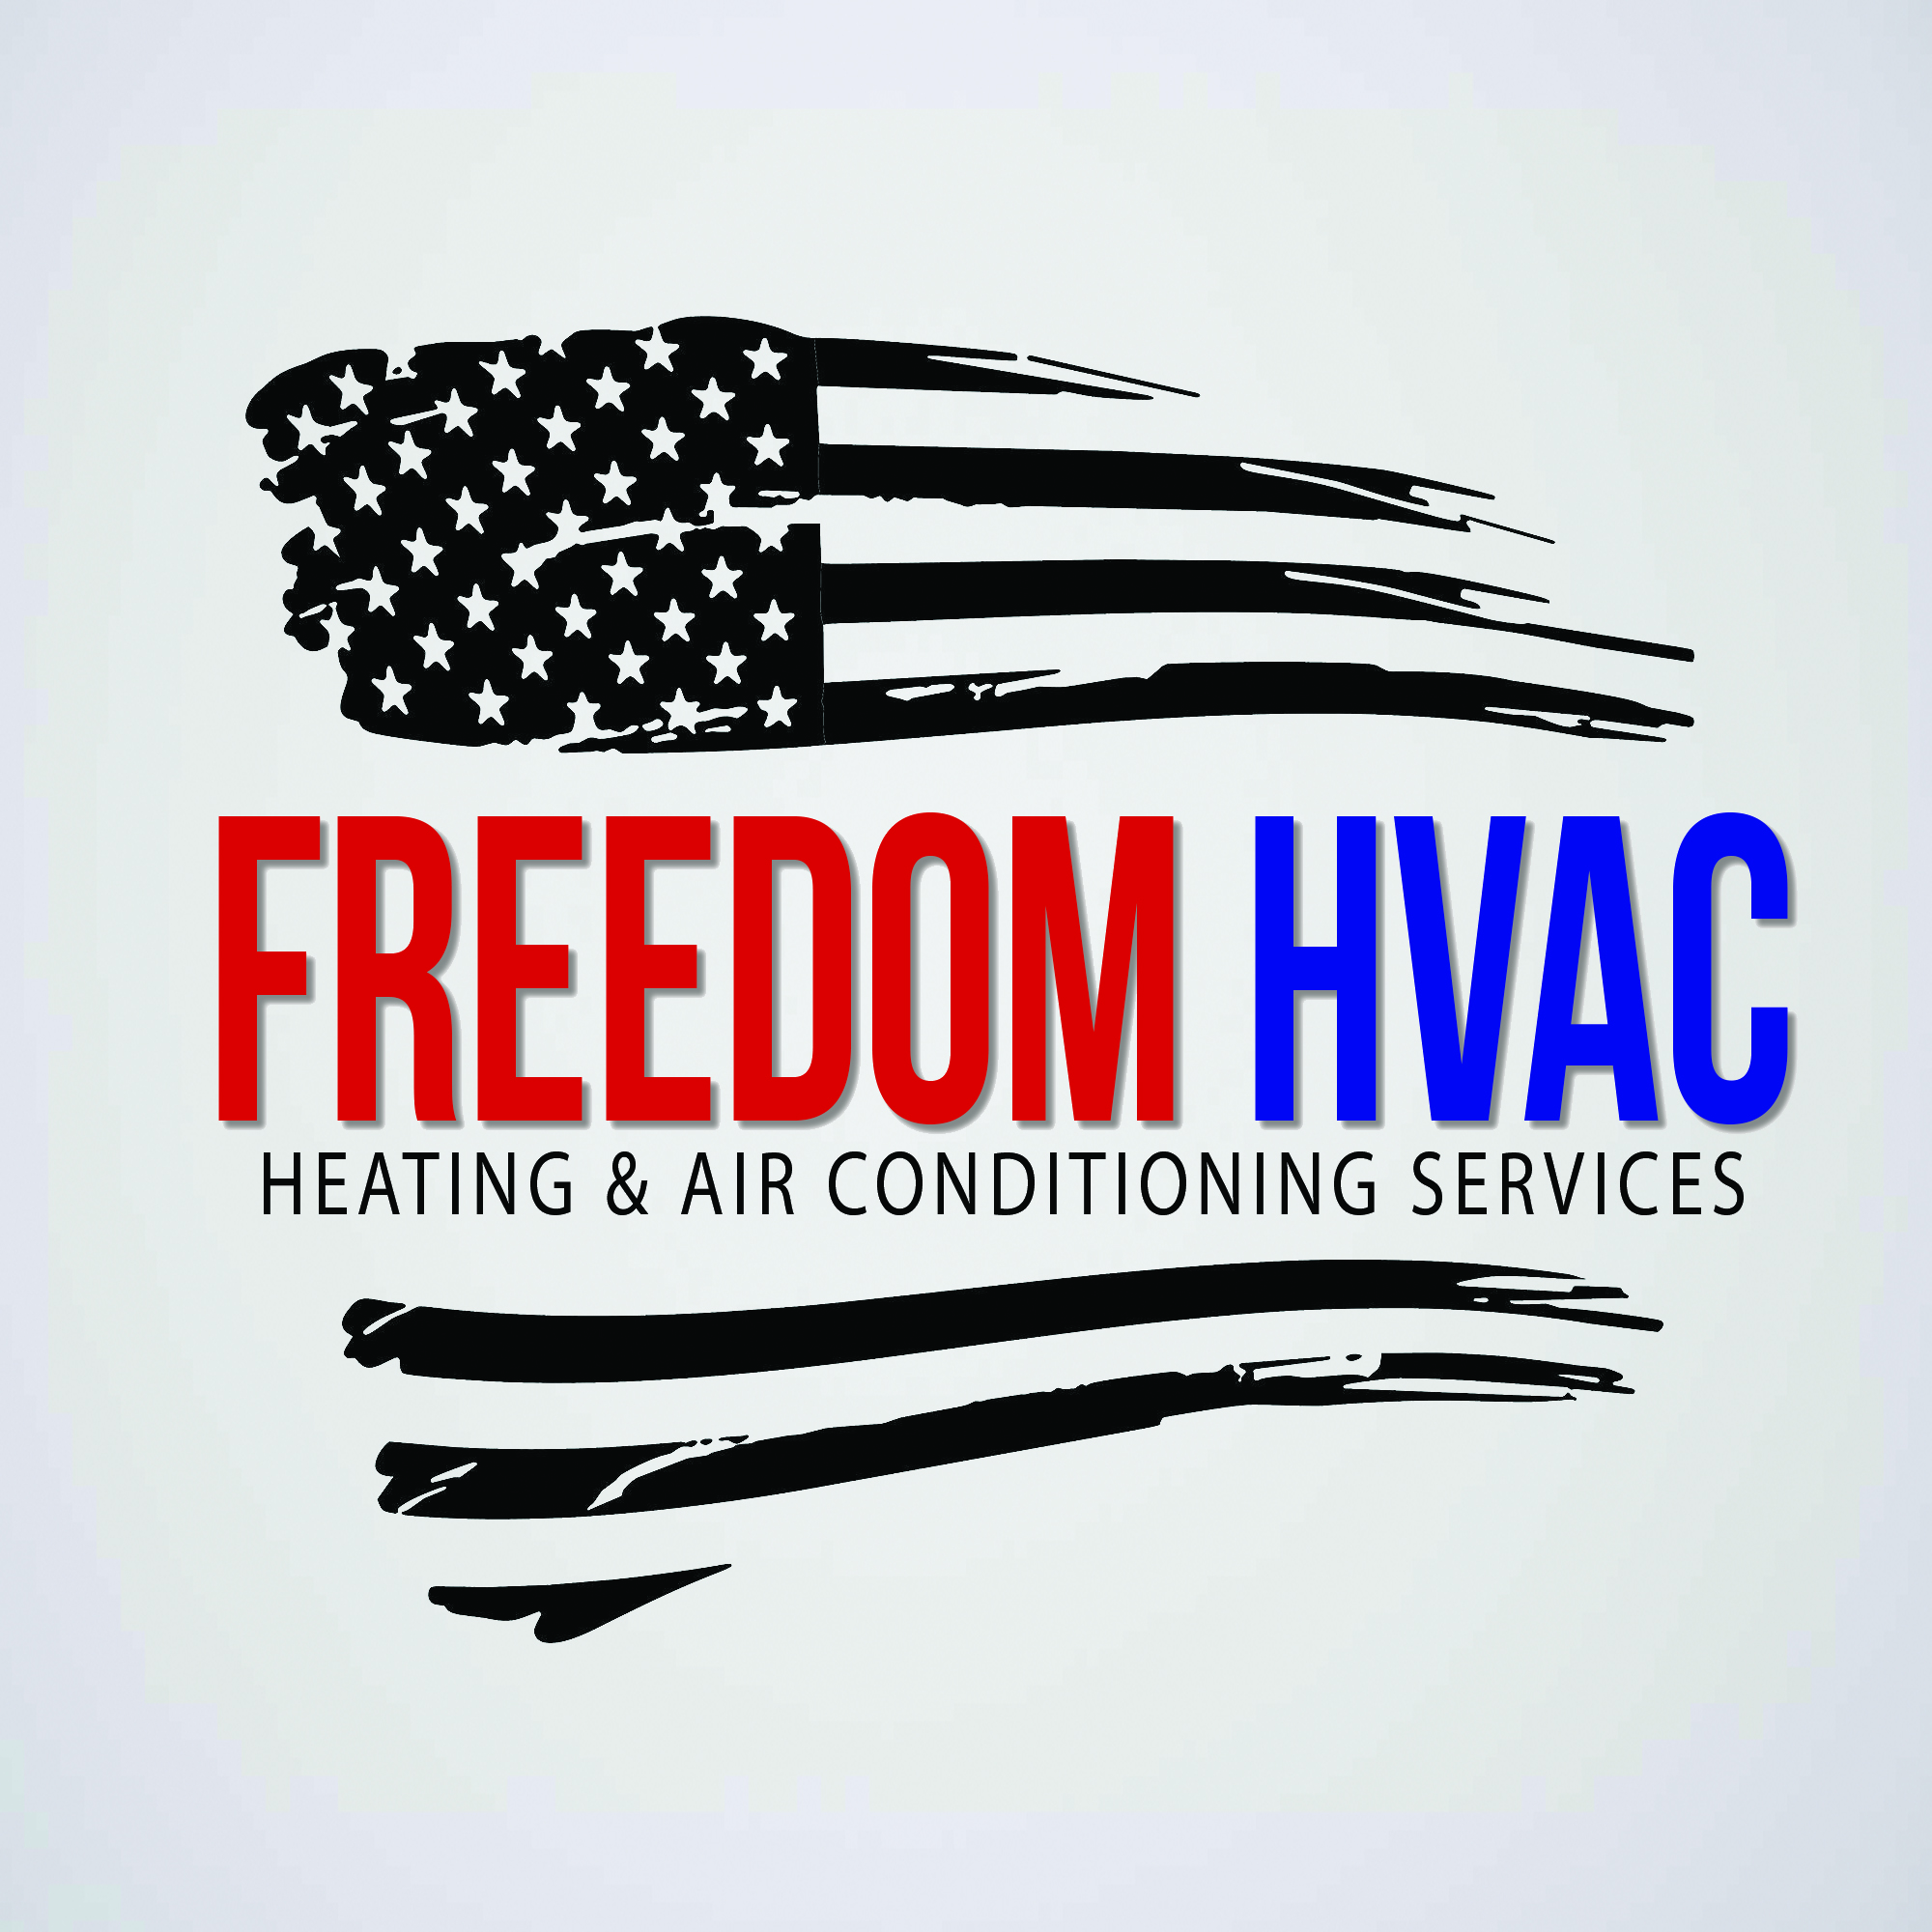 Freedom HVAC